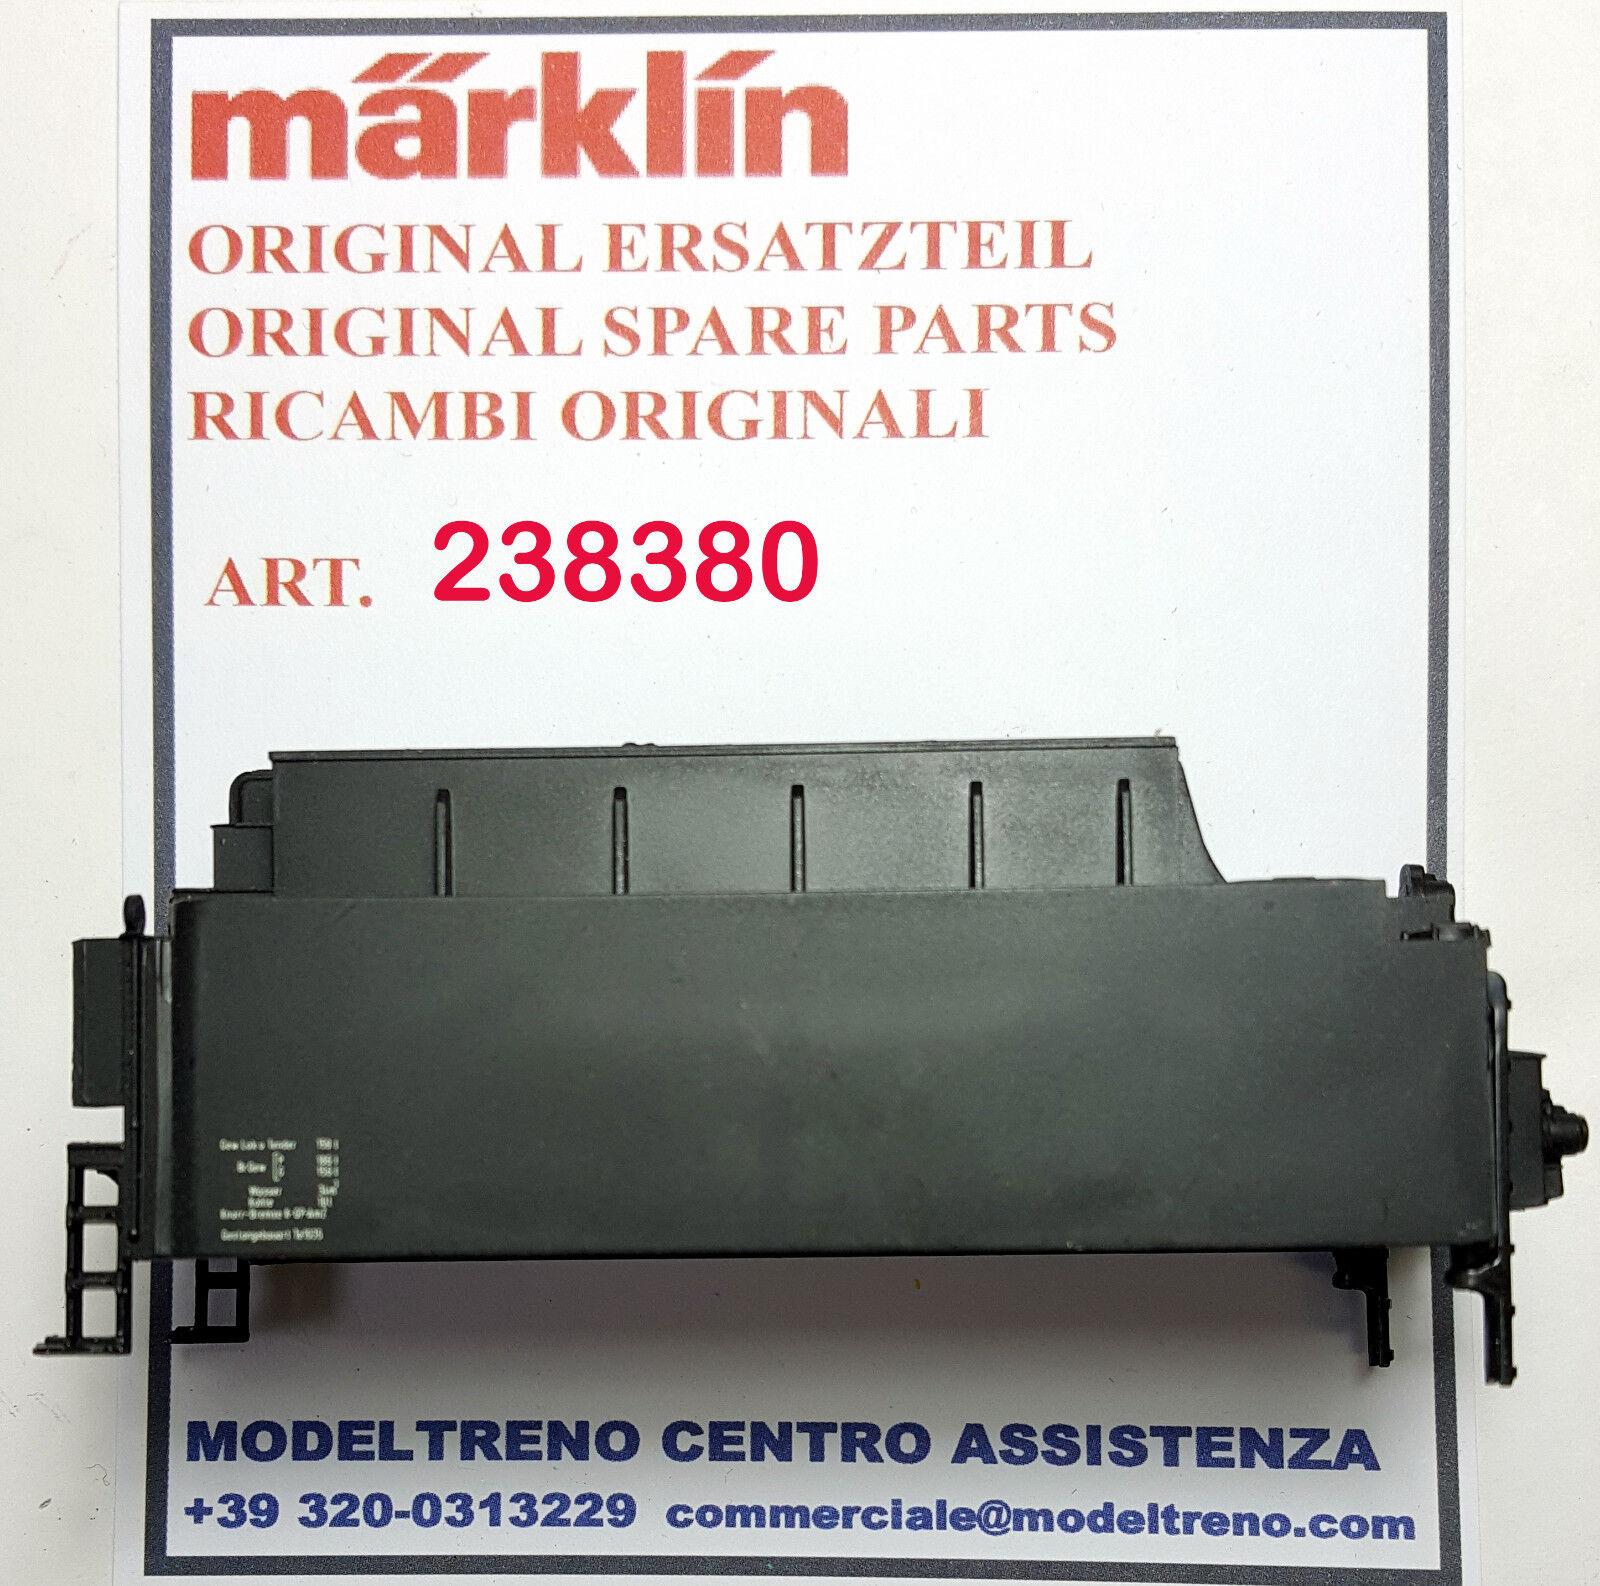 Marklin 23838 - 238380 Mantle Tender-Tender-says 3082